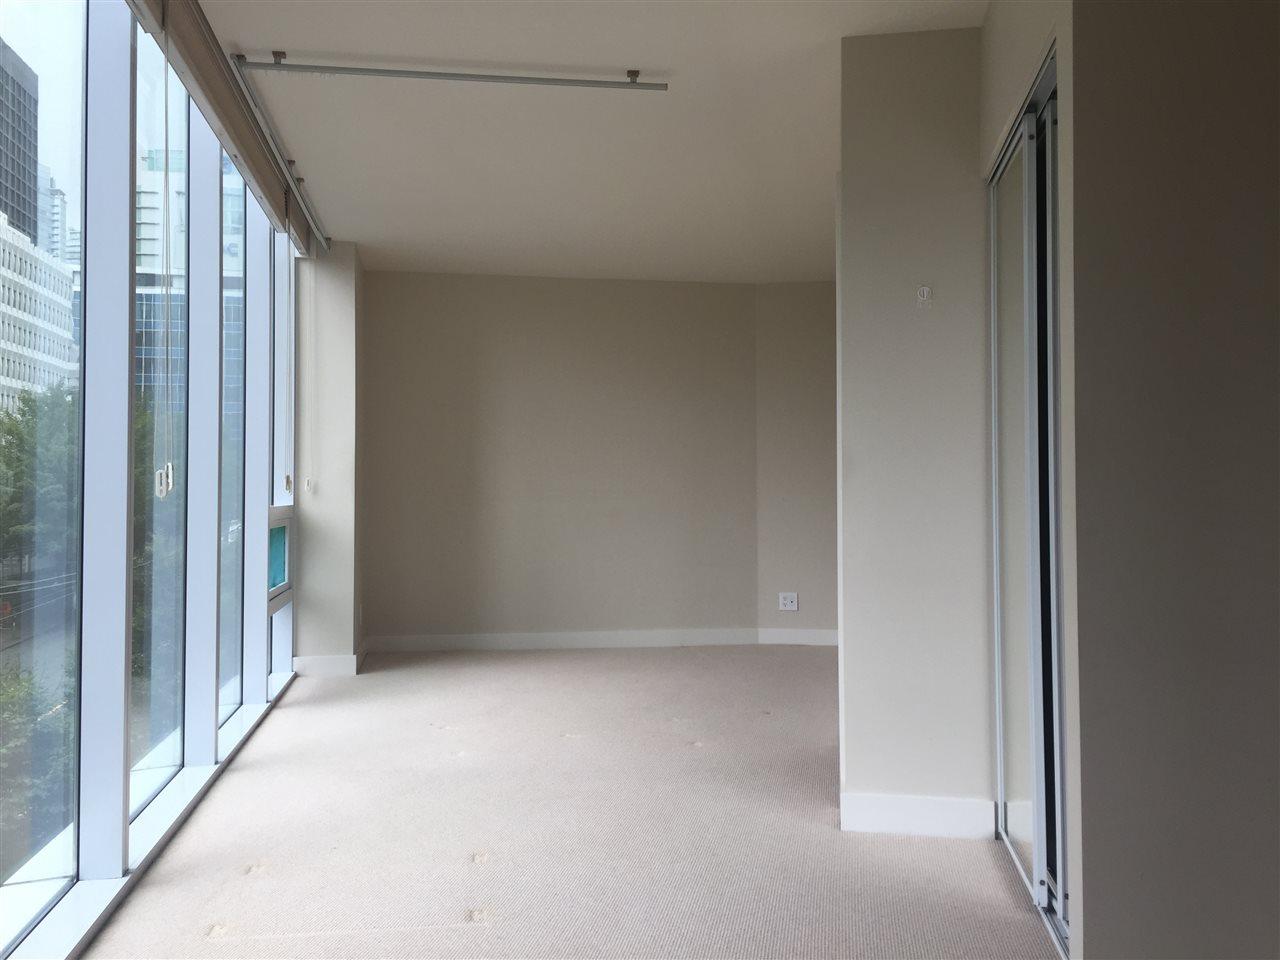 Condo Apartment at 301 1277 MELVILLE STREET, Unit 301, Vancouver West, British Columbia. Image 6